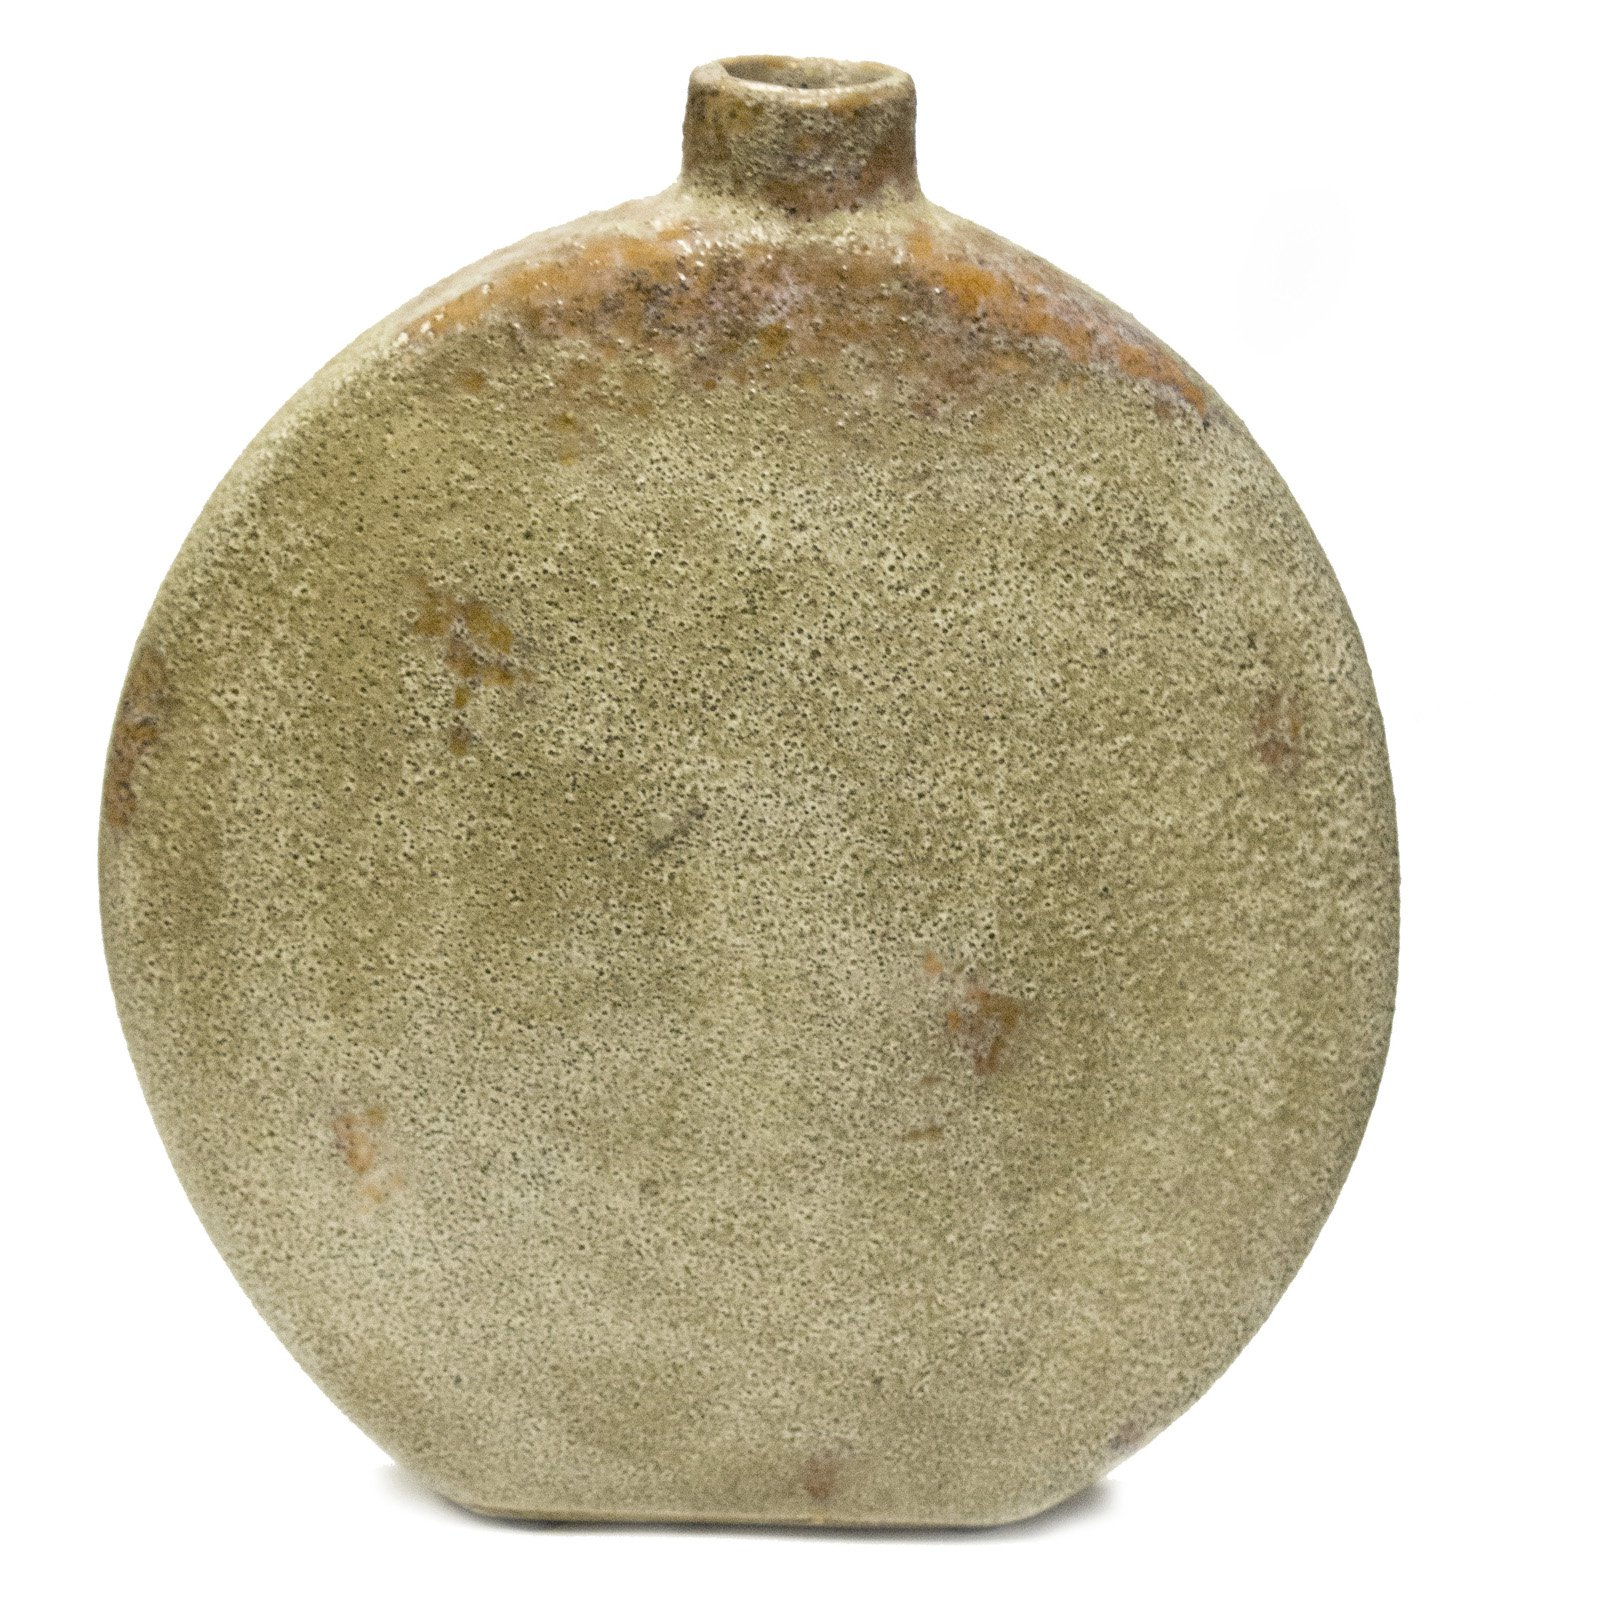 Sagebrook Home Amelia Cement Round Table Vase